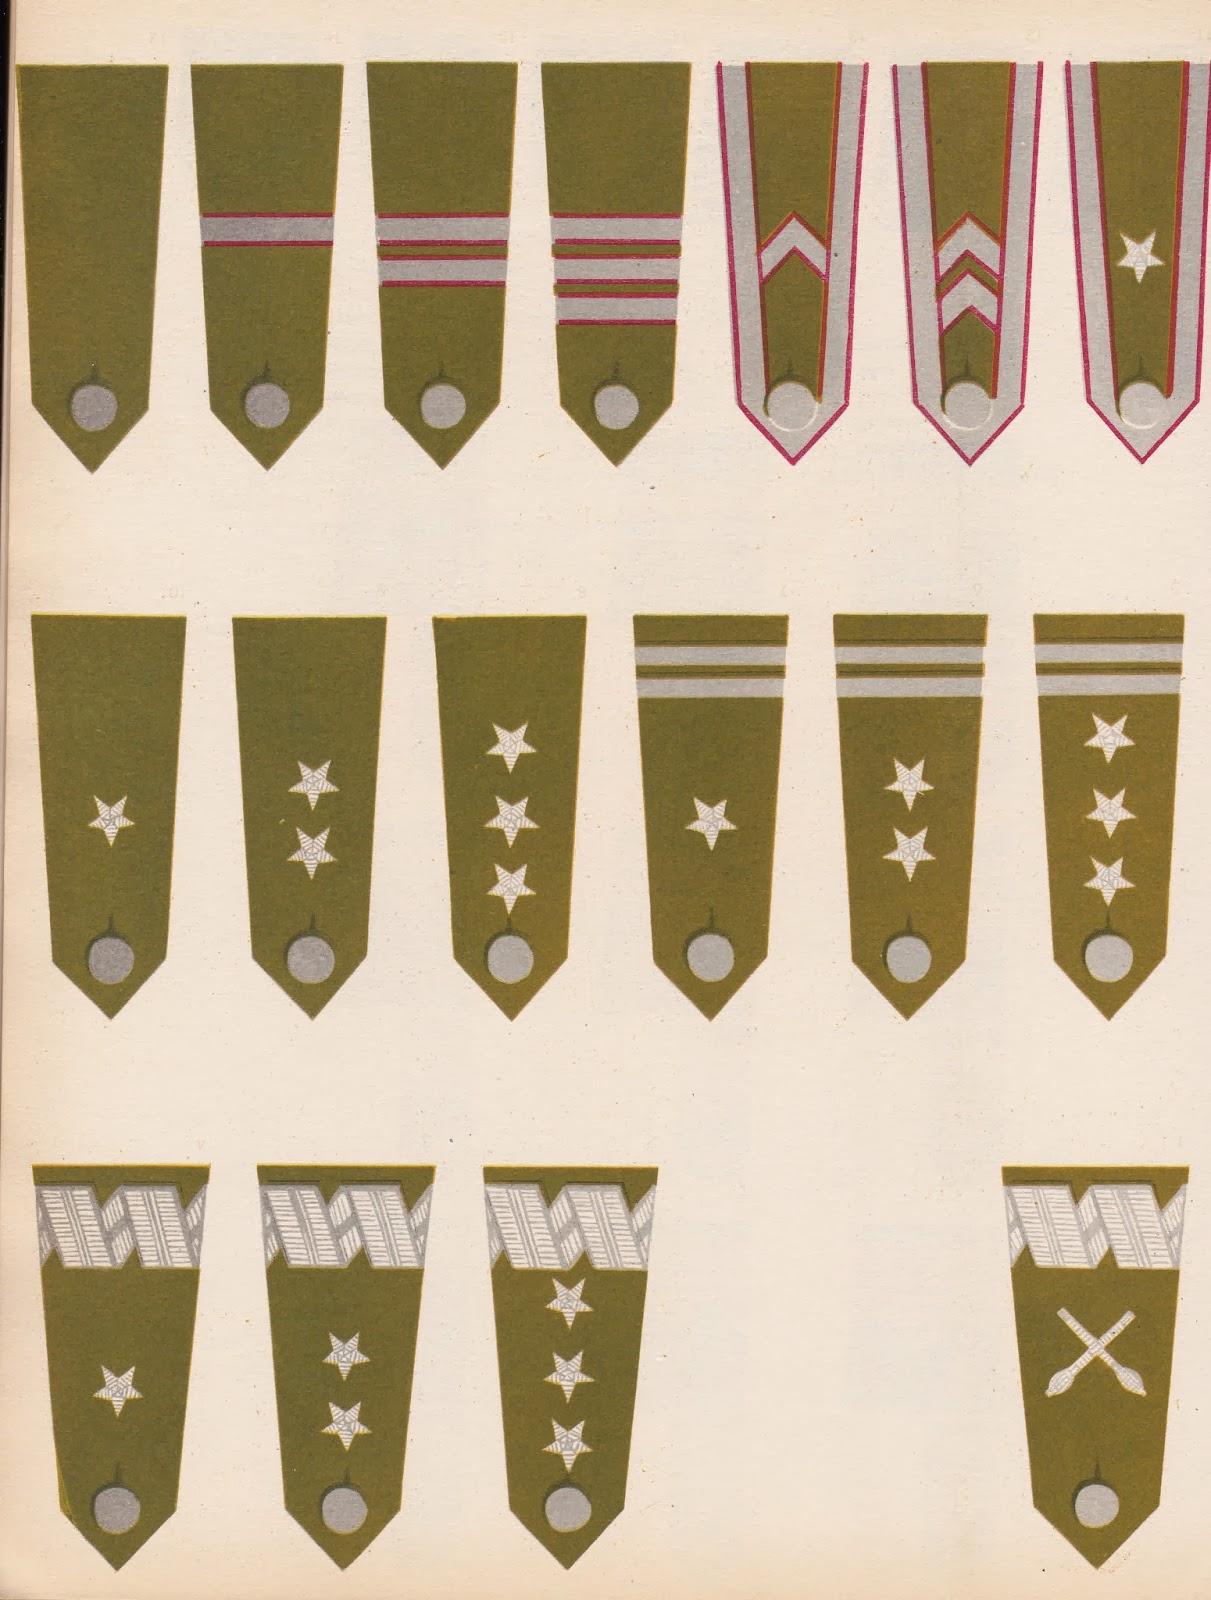 Polish Army Insignia 1939 - Polish Greatness Blog